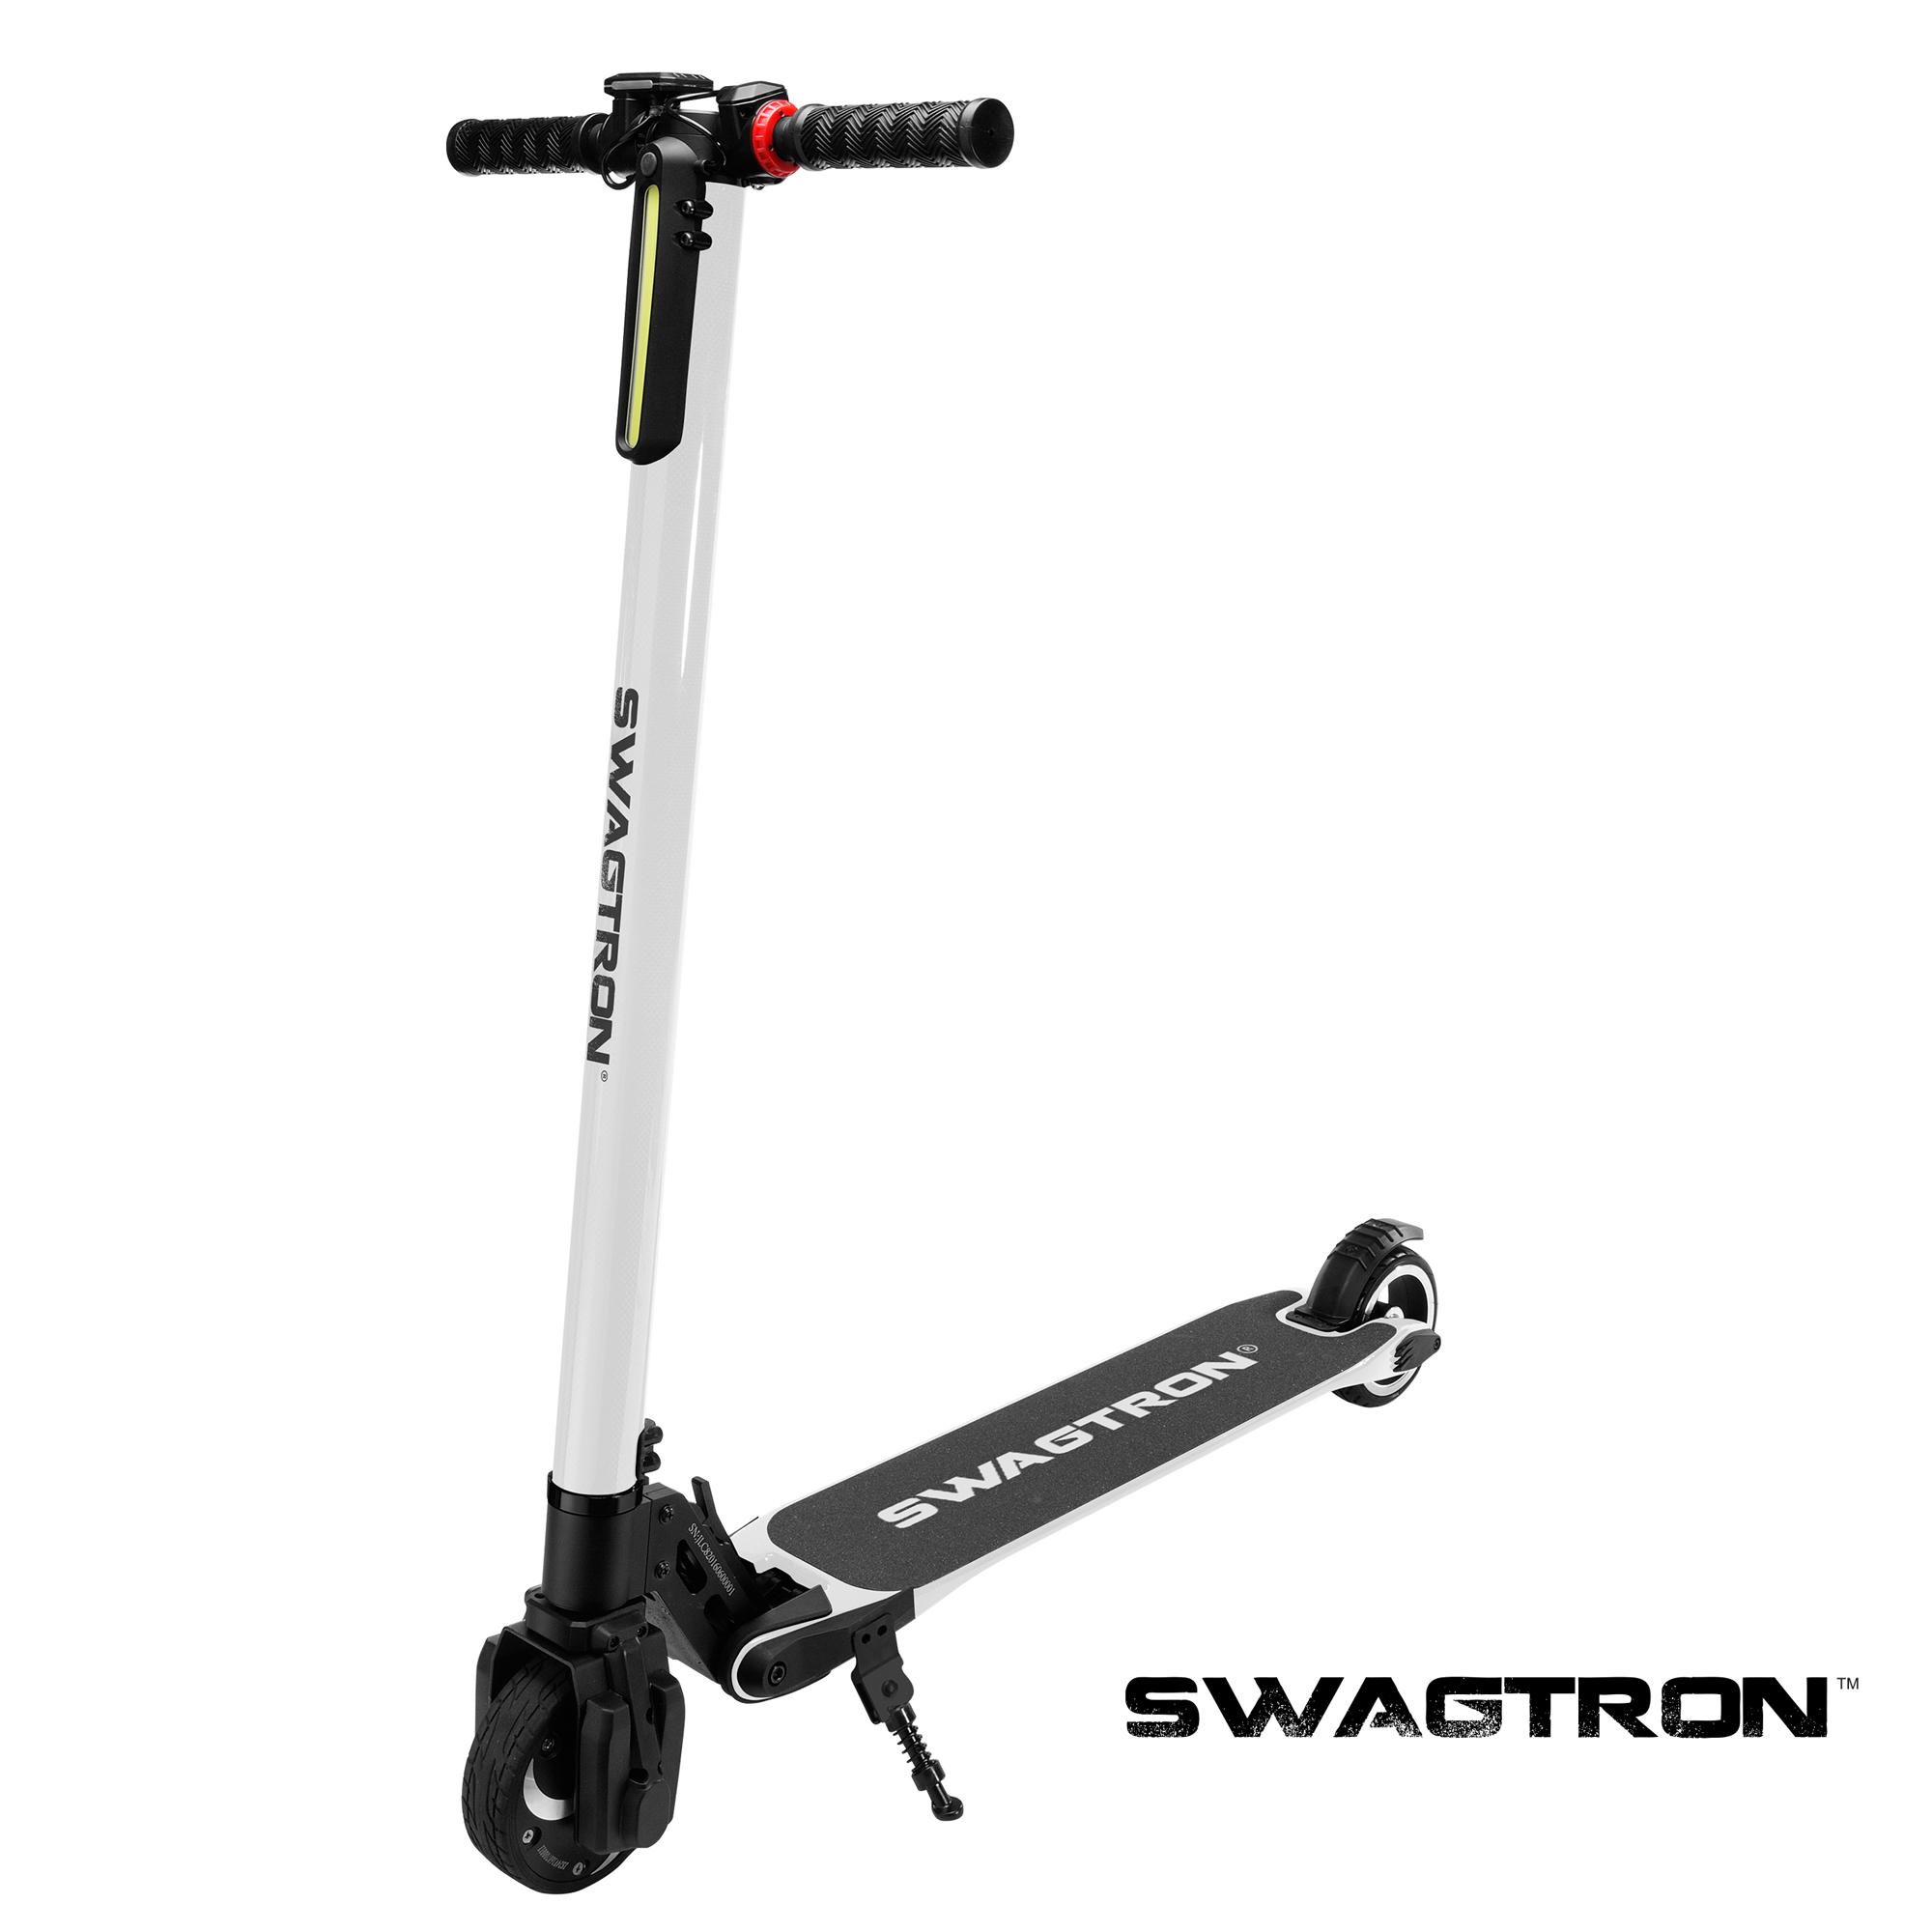 swagger carbon fiber electric scooter fast folding kid. Black Bedroom Furniture Sets. Home Design Ideas